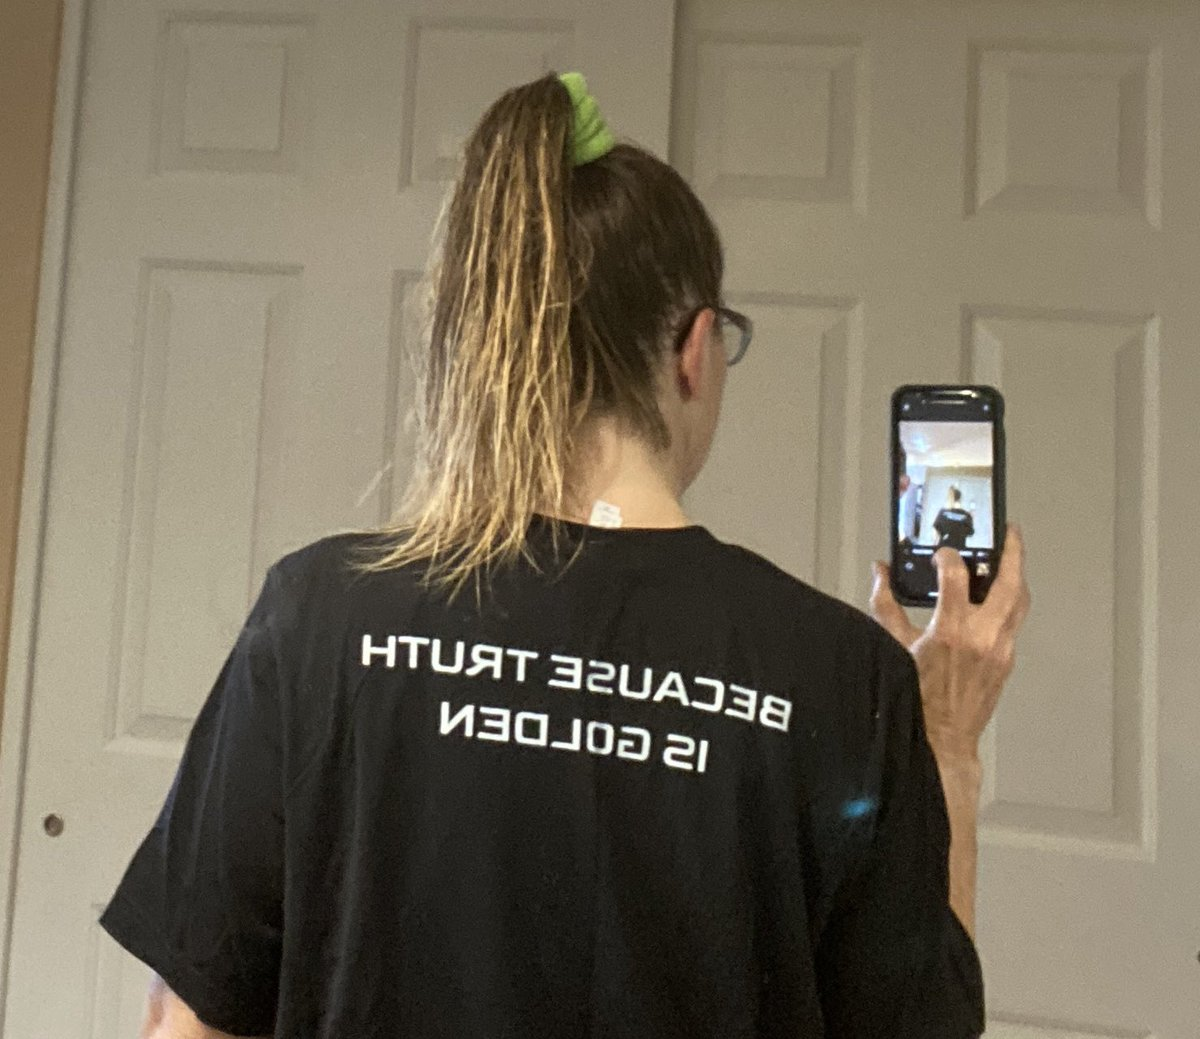 @meiselasb @MeidasTouch I do...proudly wear my t shirt!!!